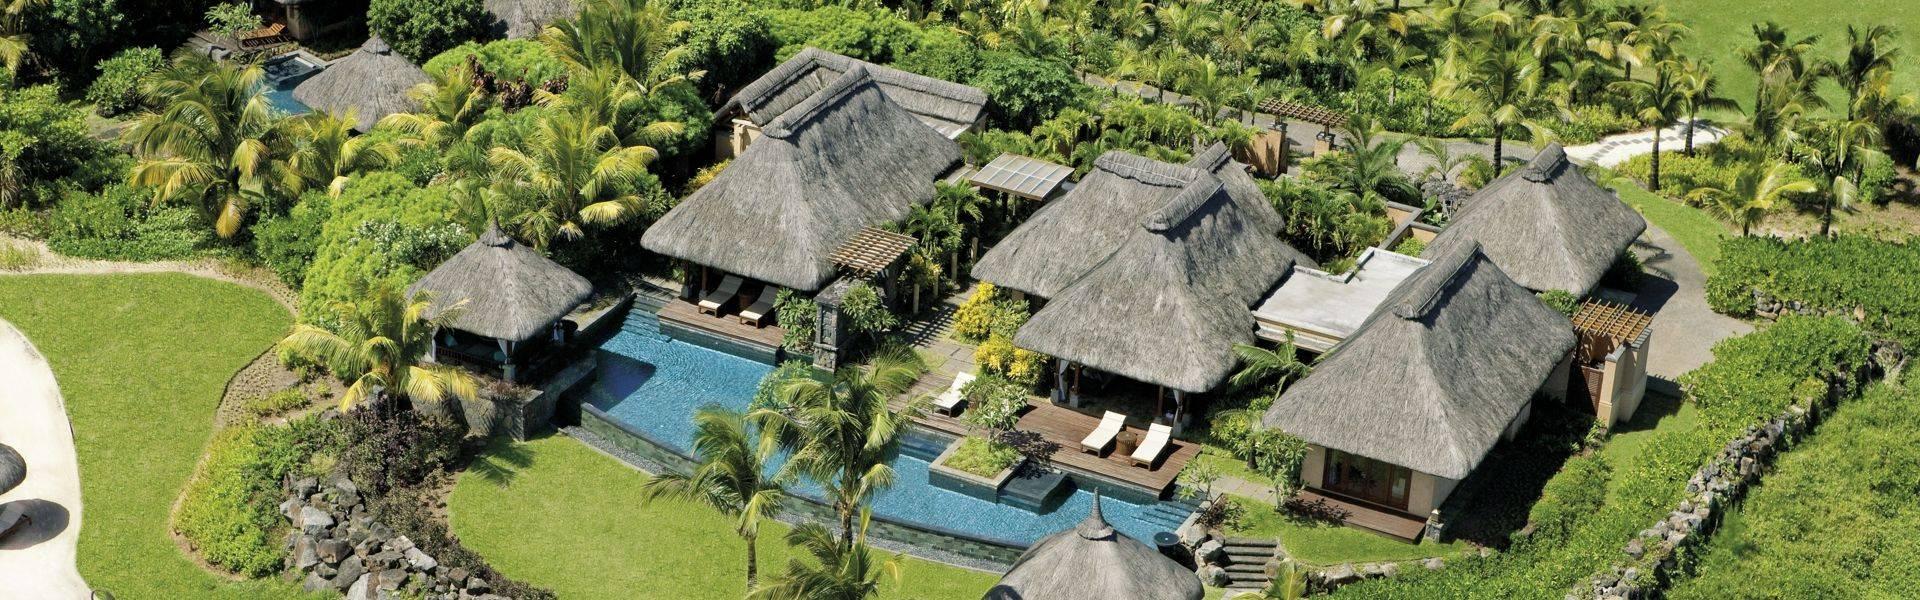 Shanti-Maurice-aerial-view.jpg